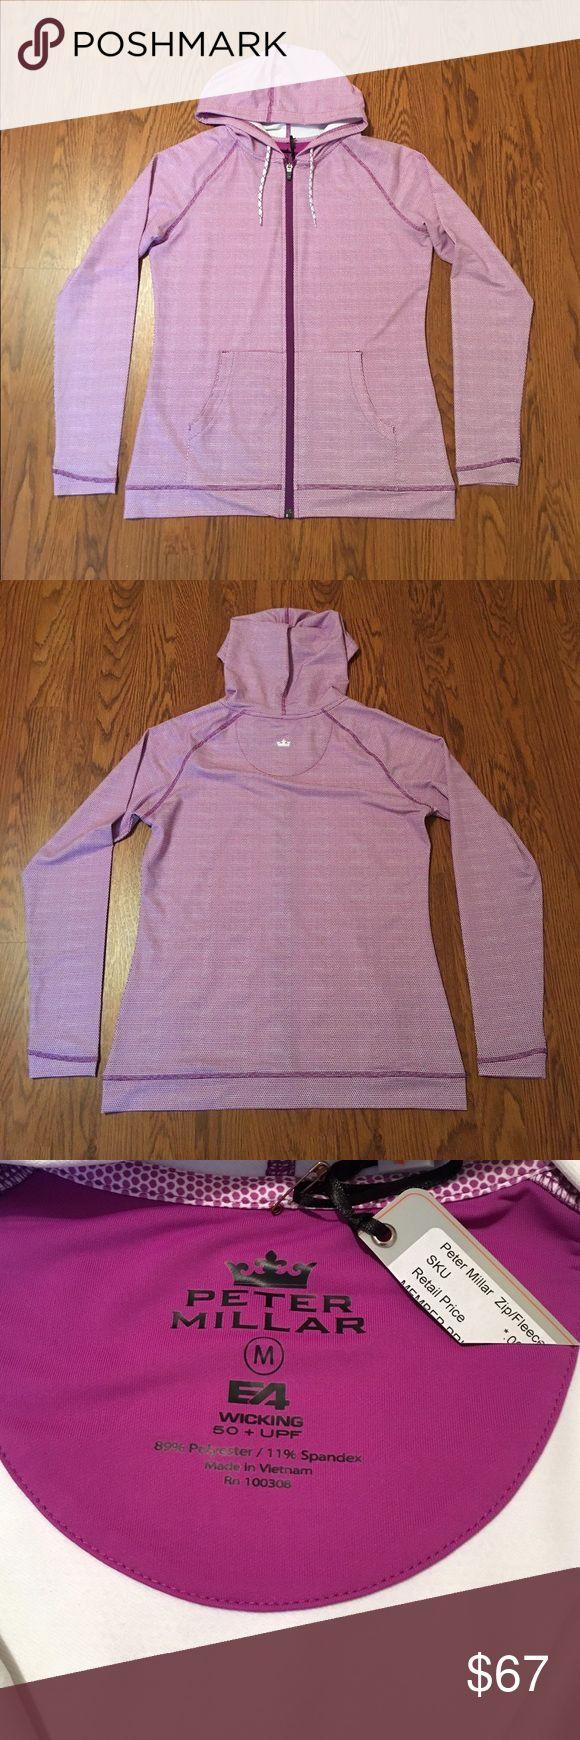 NWT Peter Millar E4 Performance Zip-Up hoodie Brand new purple polka-dot pattern Peter Millar E4 Performance full-zip up hoodie. Size M Peter Millar Tops Sweatshirts & Hoodies